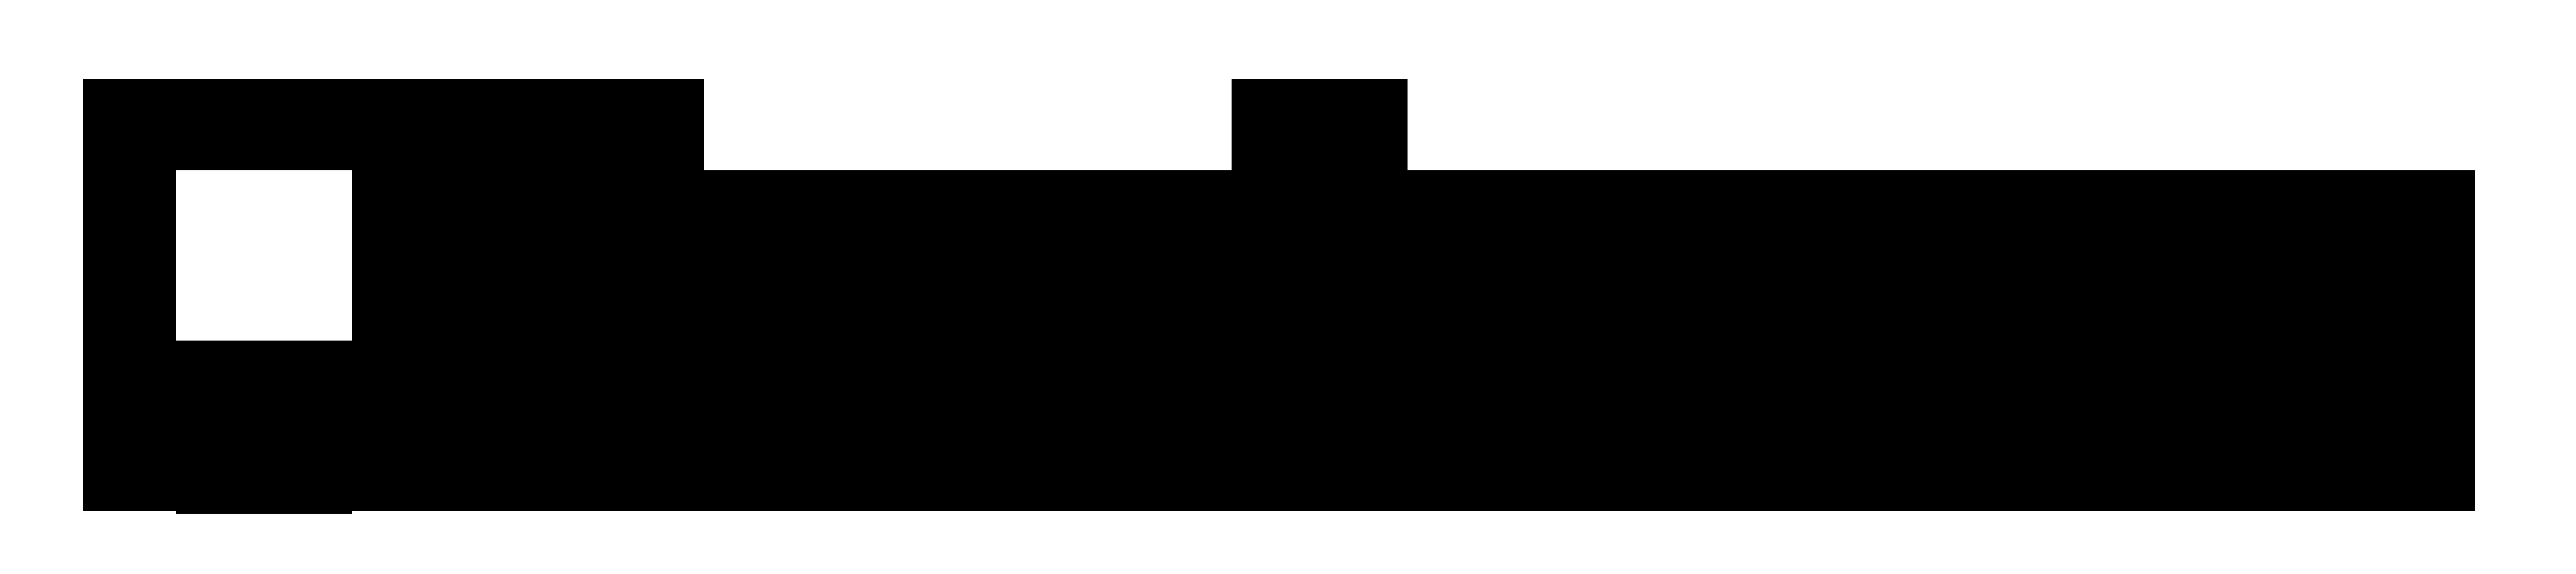 Luminovo Company logo black - the electronics operating system